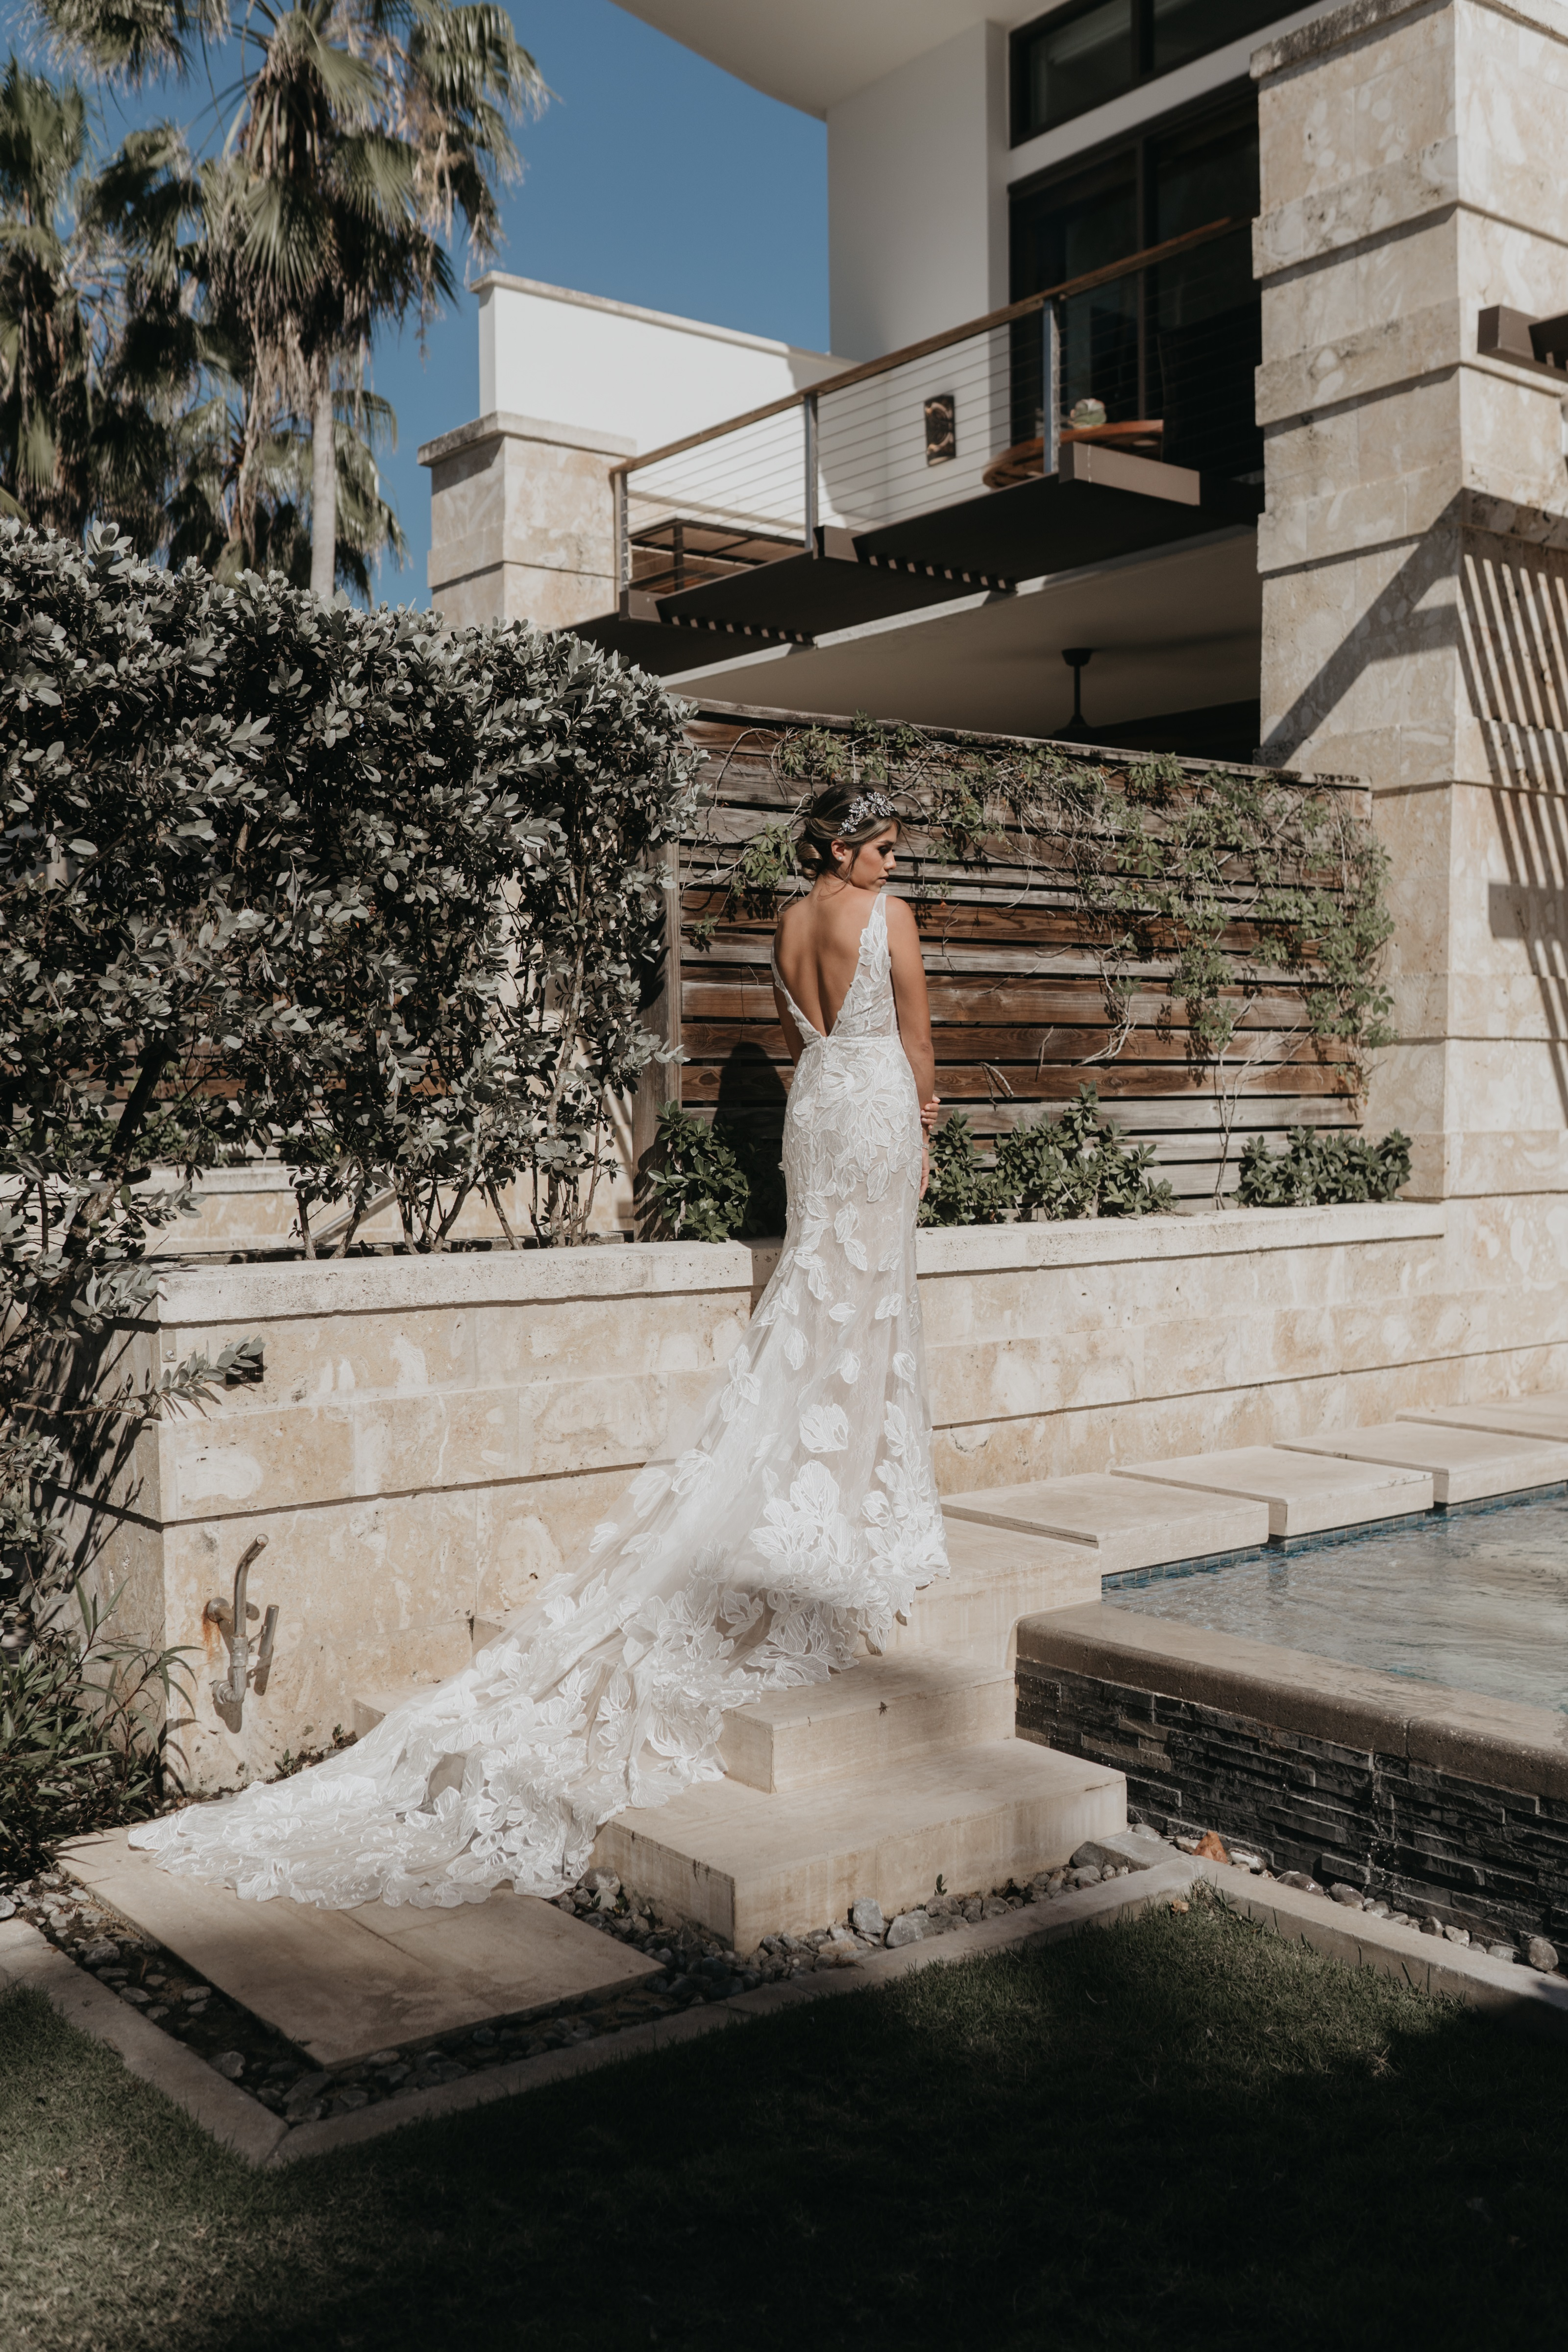 Atuendo de la novia: D'Royal Bride (Foto: Artonico Stories)